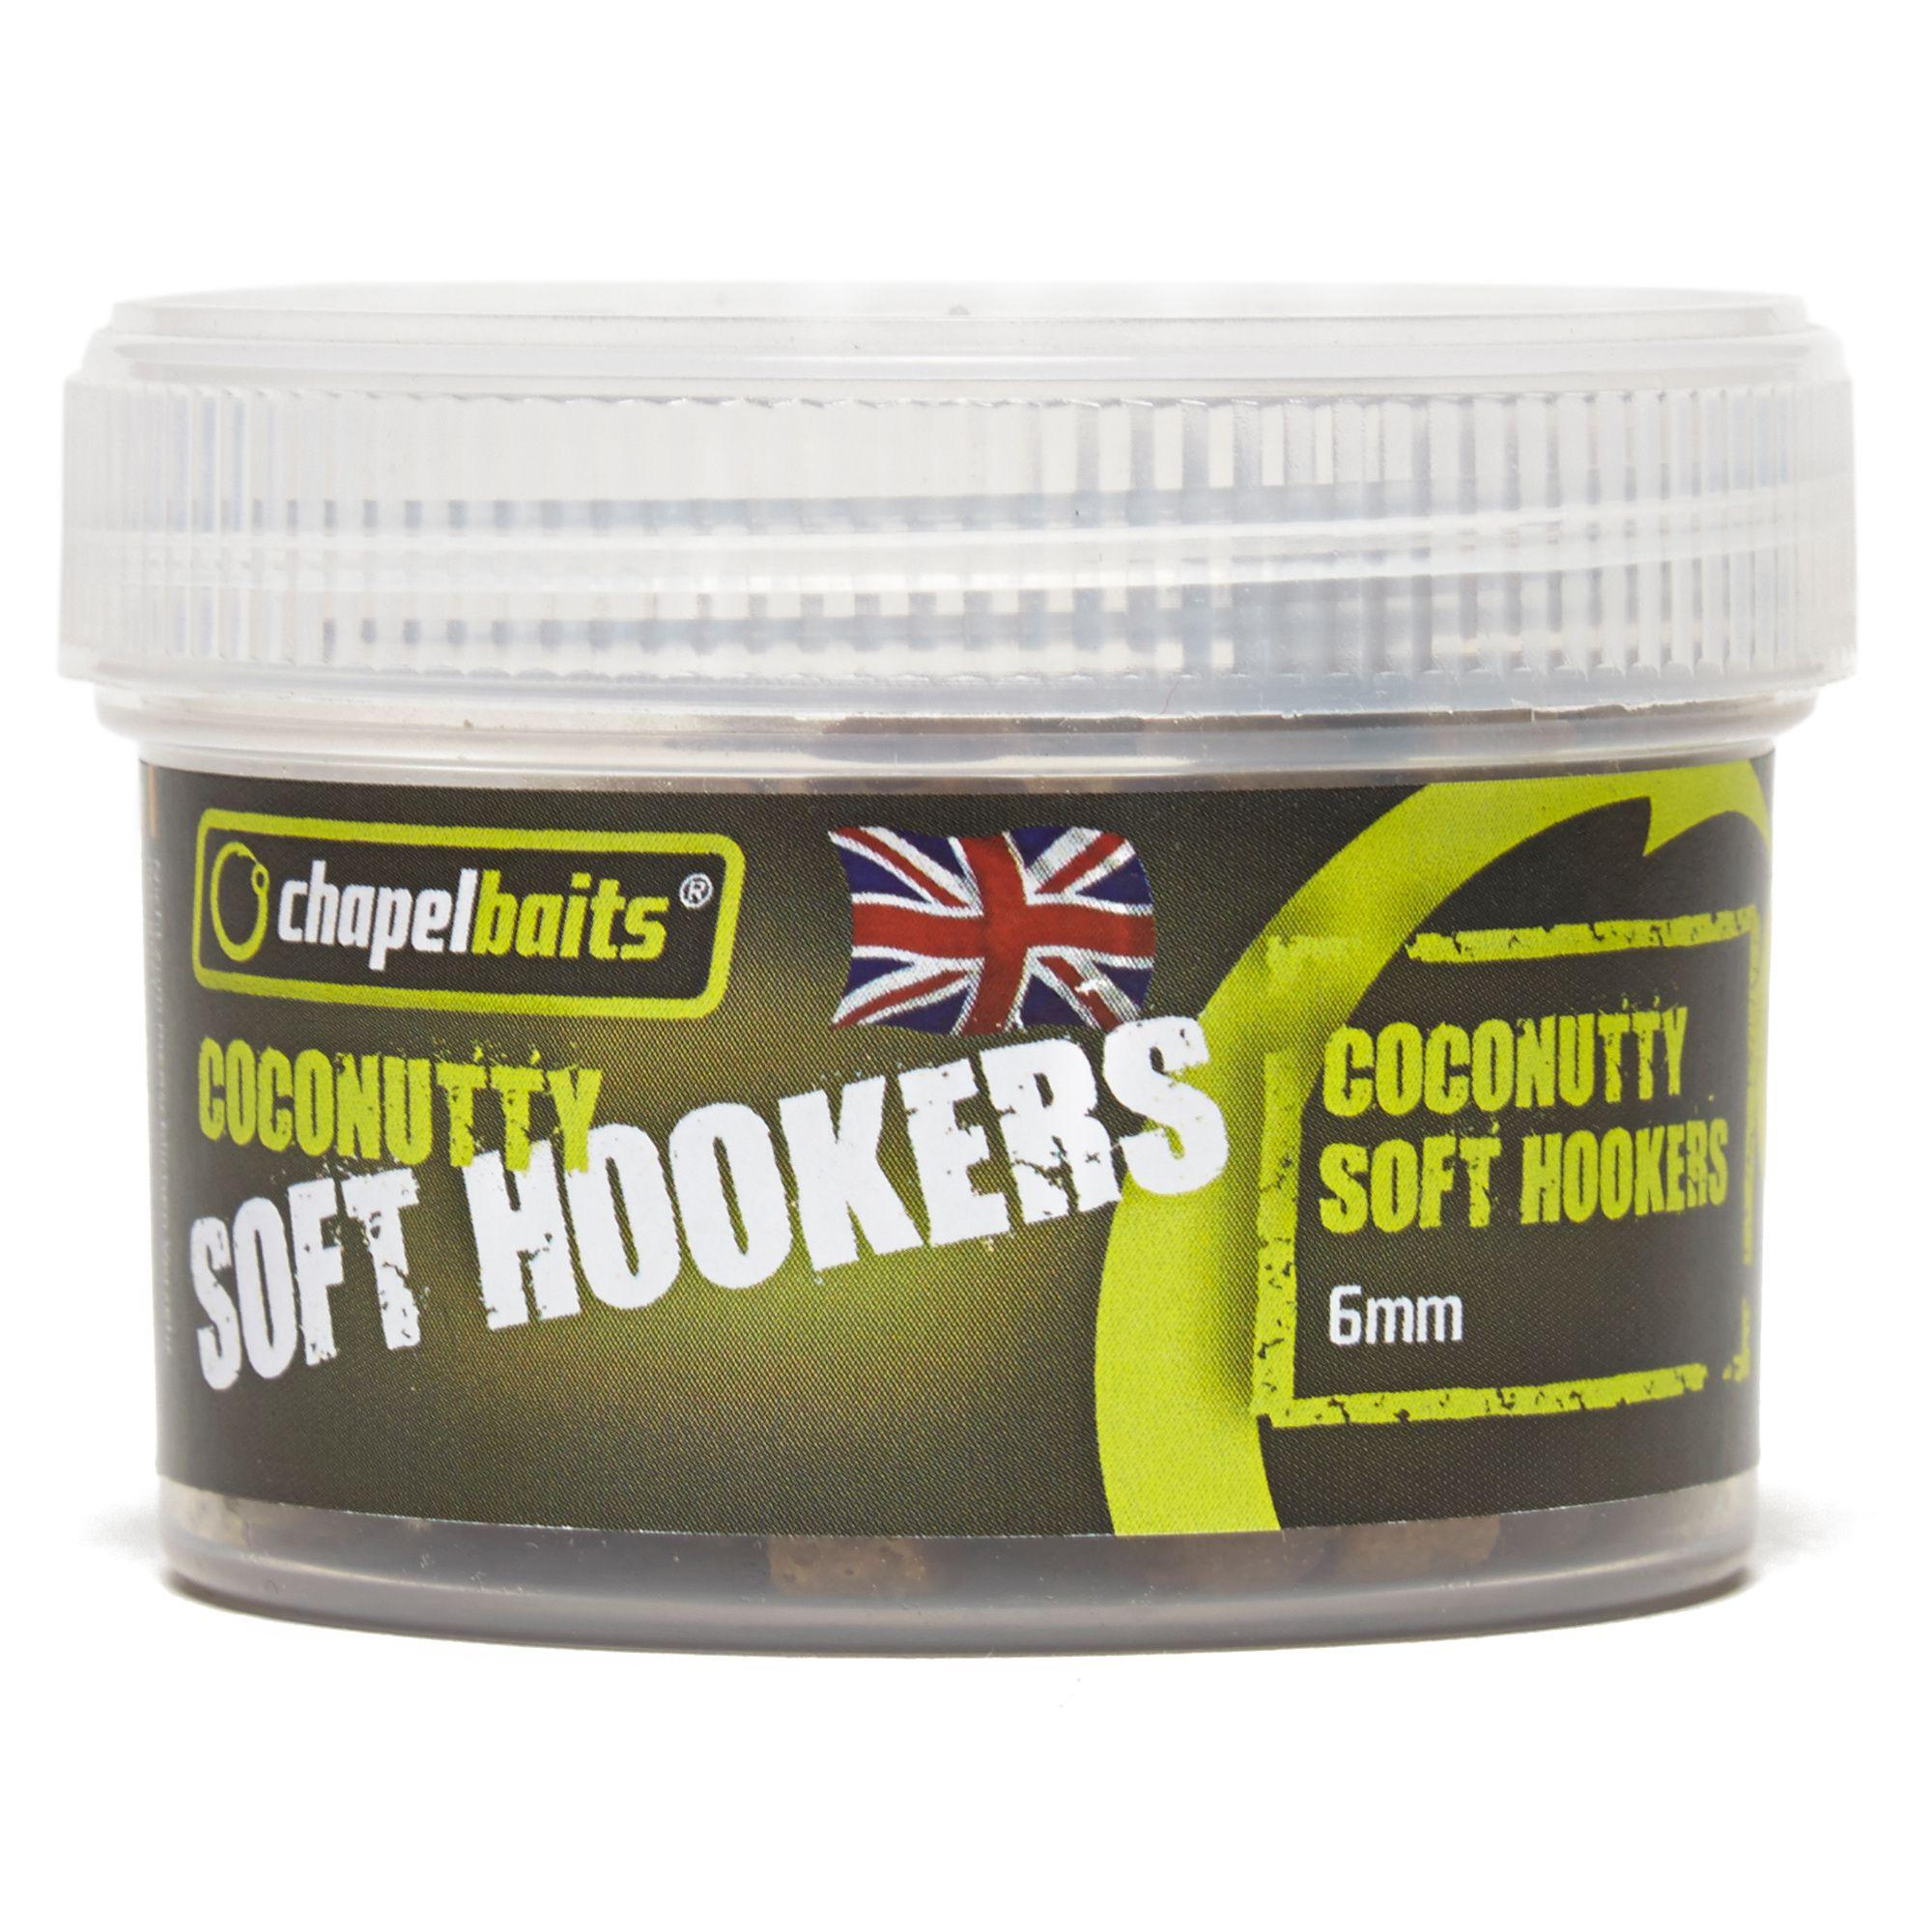 CHAPEL BAITS 6mm Soft Hooker Pellets, Coconutty